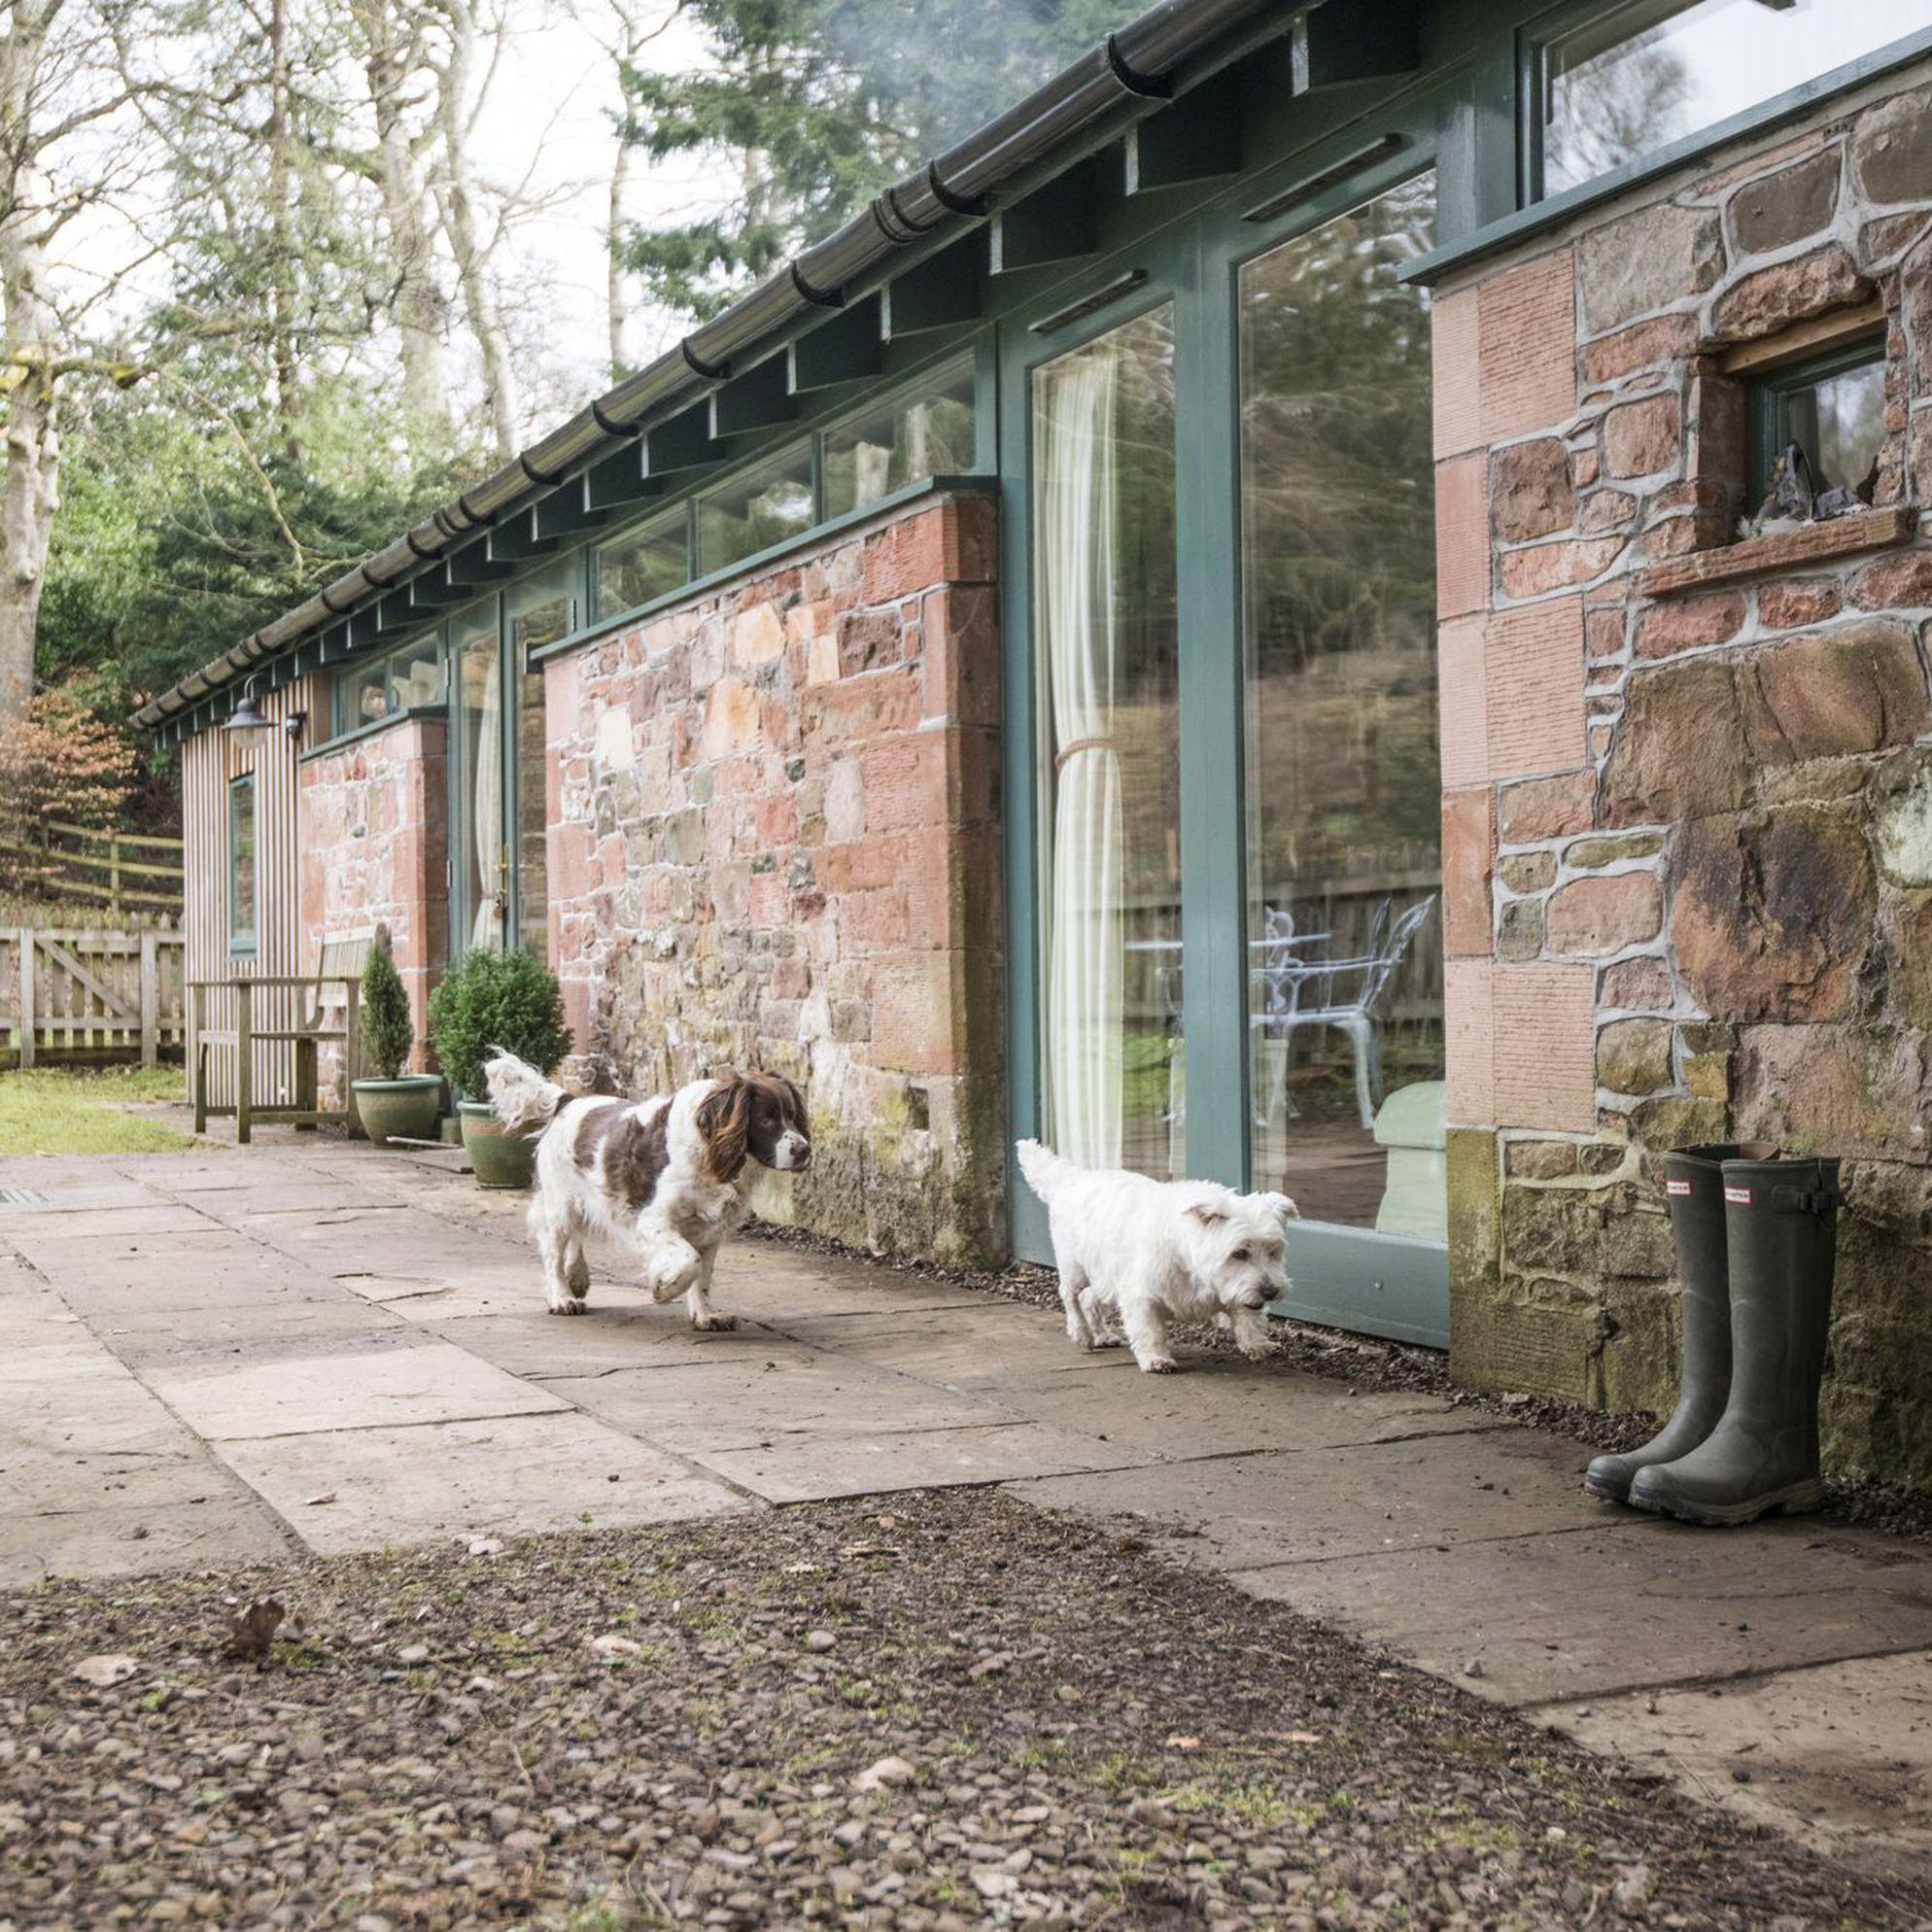 Dog-friendly holidays in Scotland